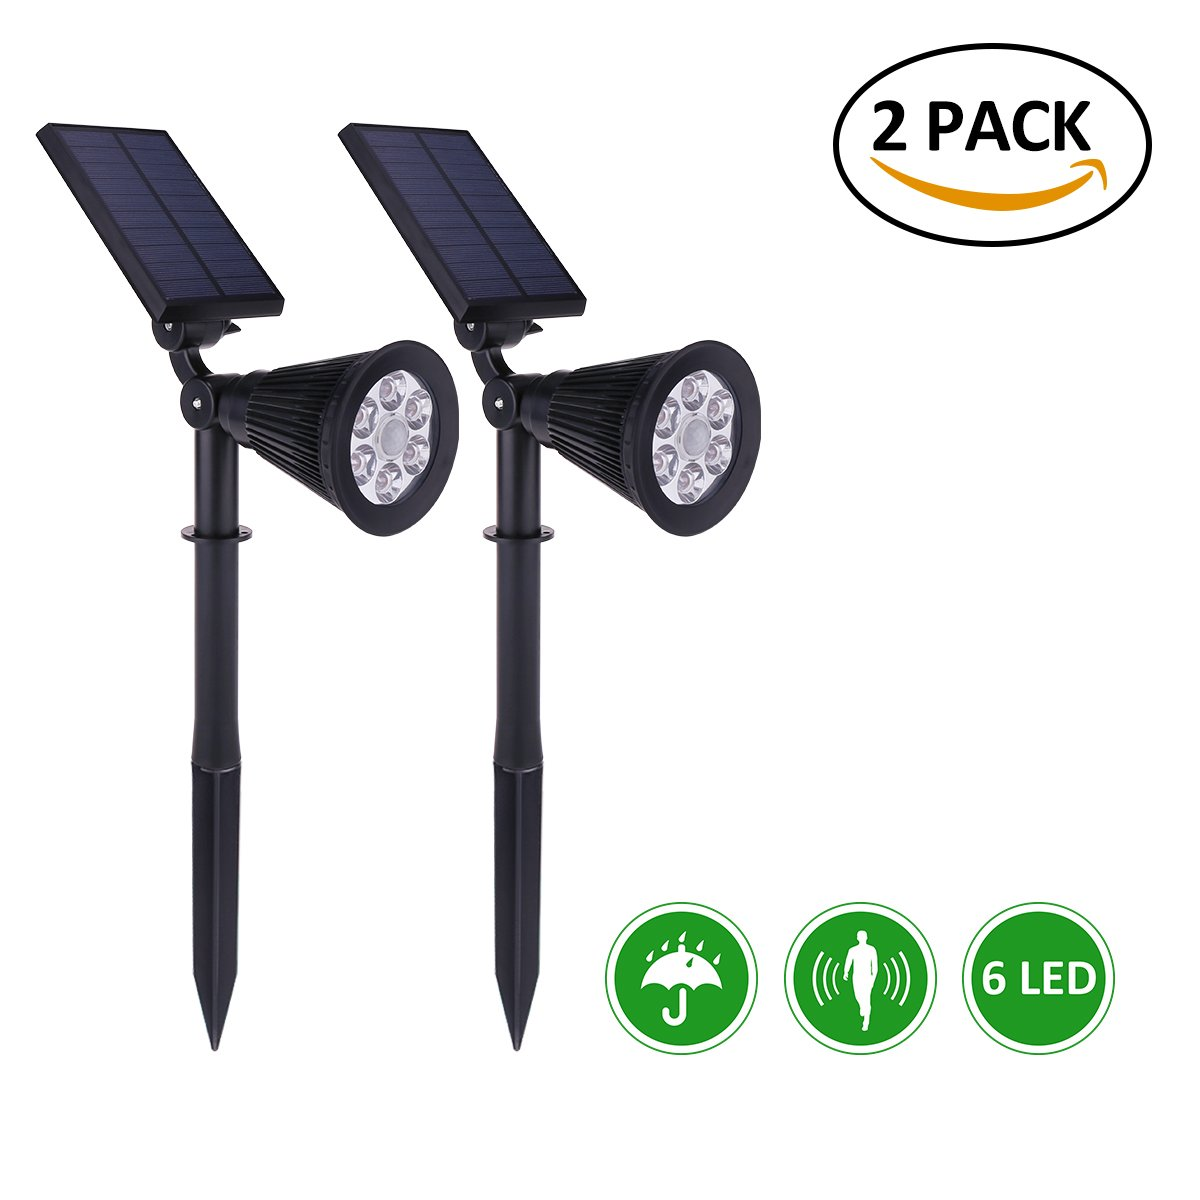 Amazoncom AICEDA 6 LED Motion Sensor Solar Lights Waterproof